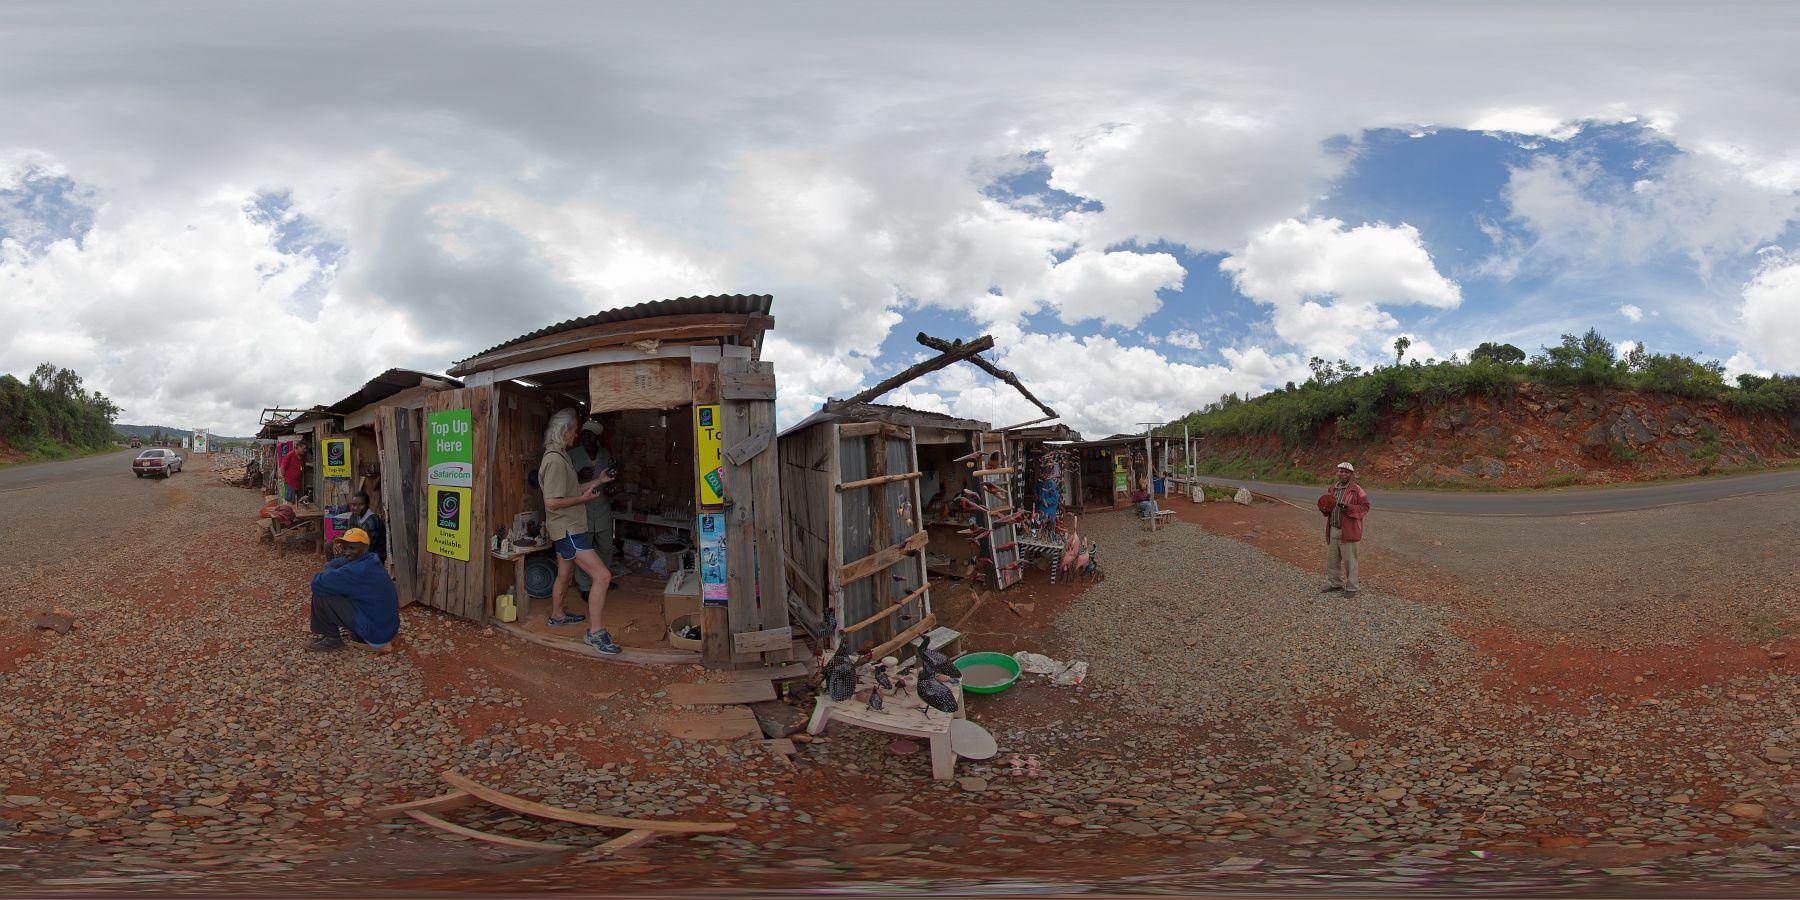 Panorama Kenia Nakuru Ausblick Ebene 5